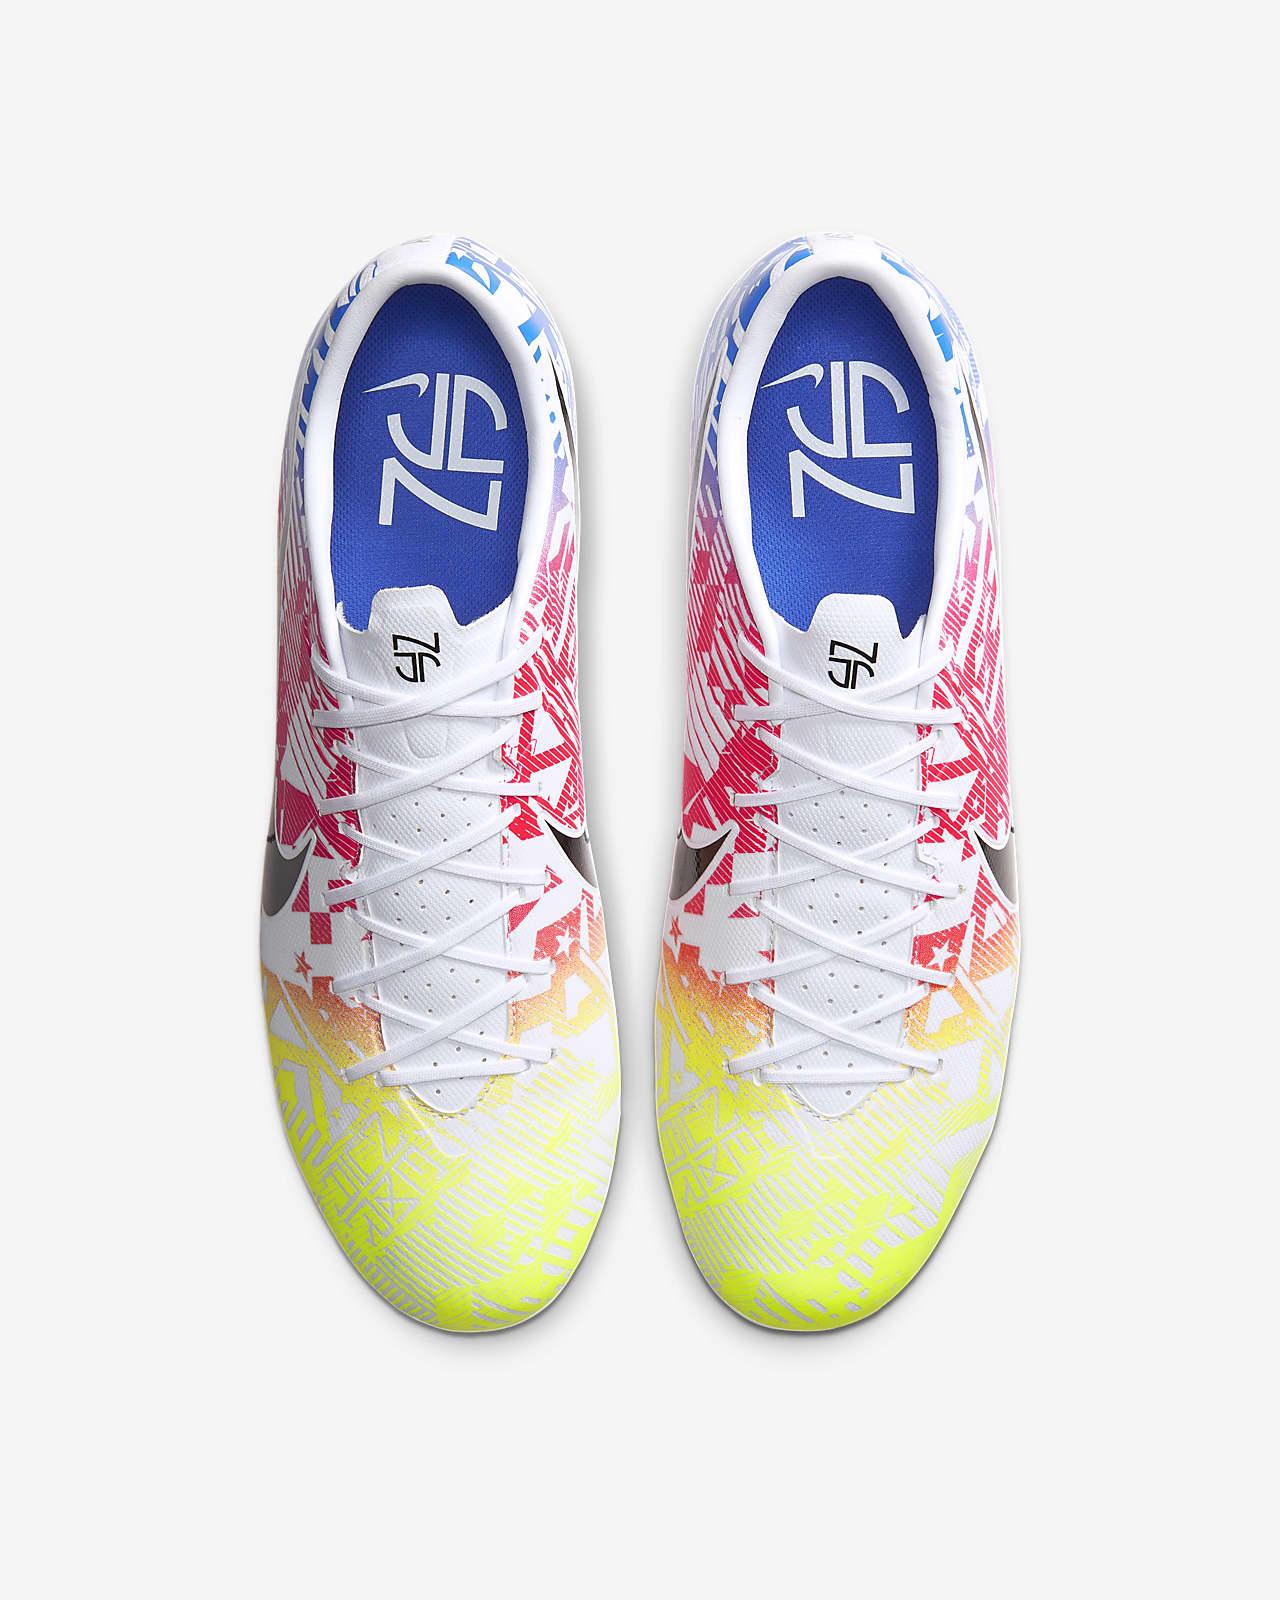 Giày đá bóng Nike Mercurial Vapor 13 Academy MG NJR Jogo Prismatico